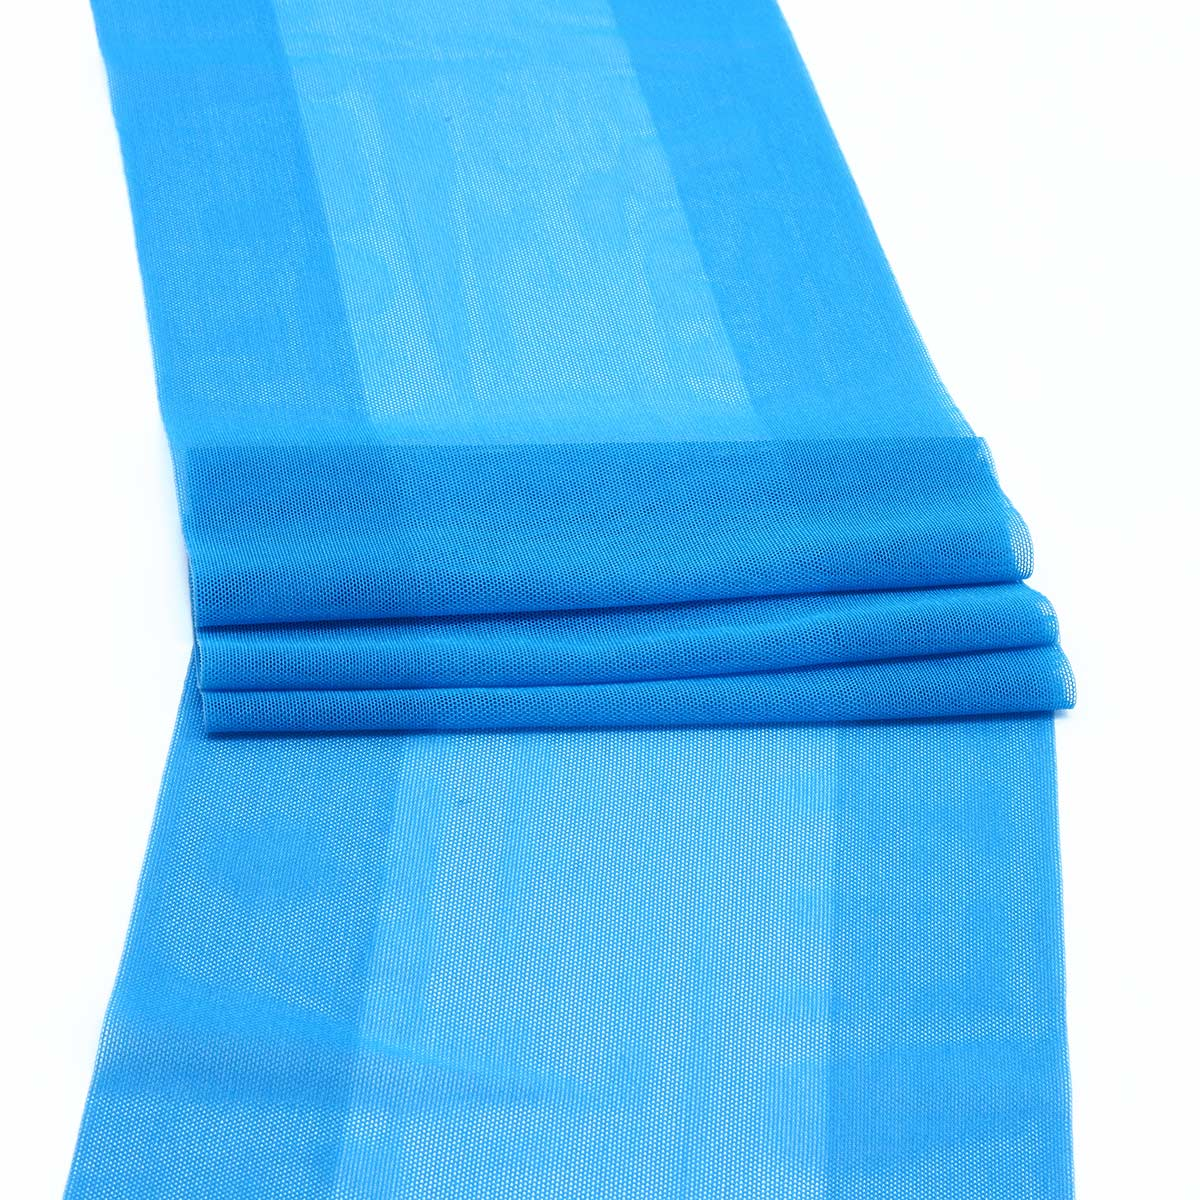 SU 17 Ткань эластичная бельевая 13,5 см*10